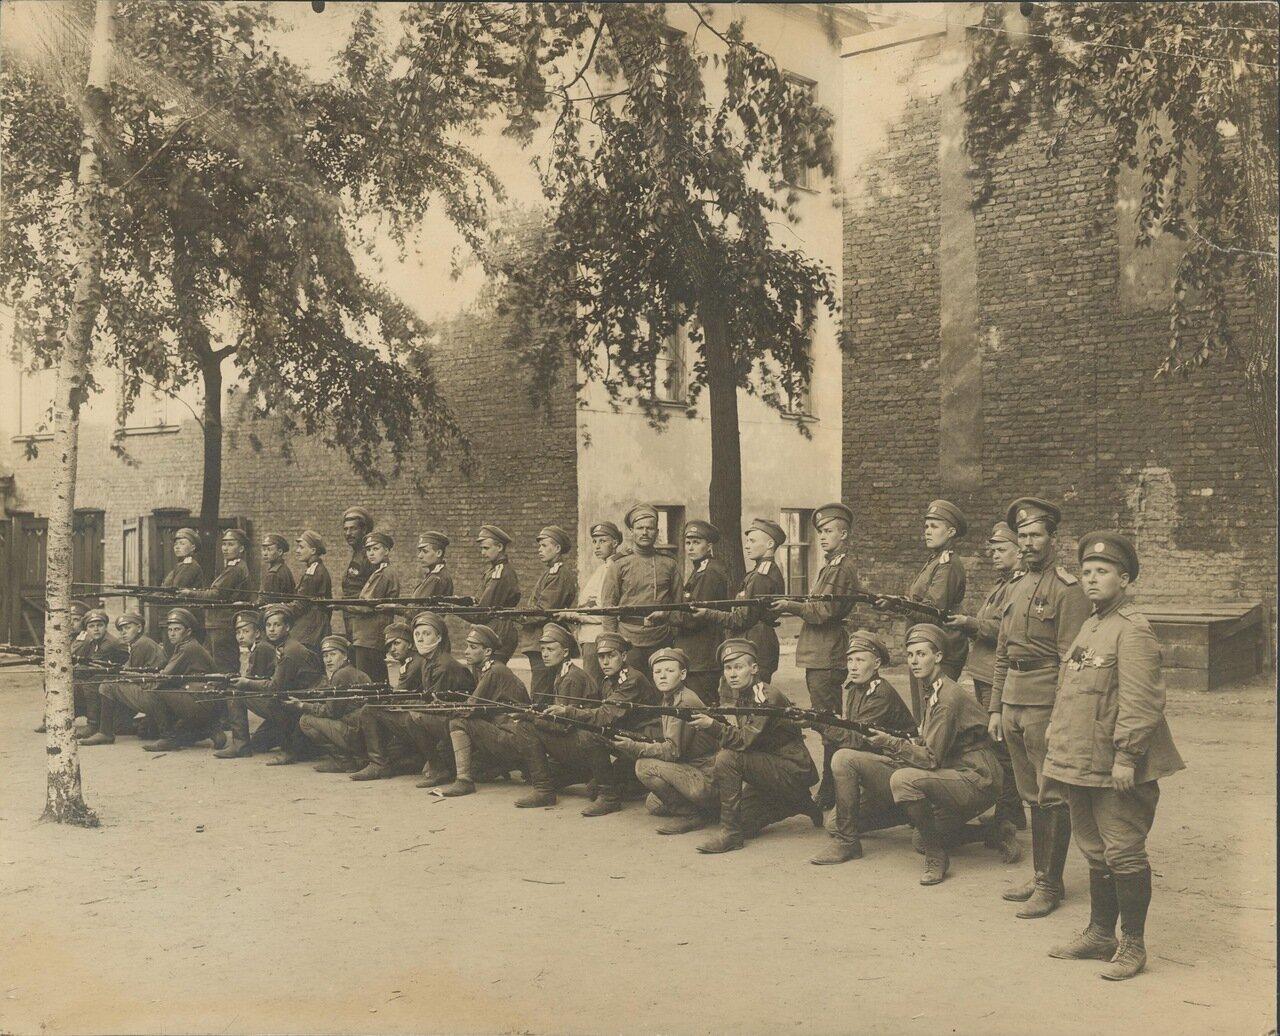 Женский батальон смерти. Июнь 1917